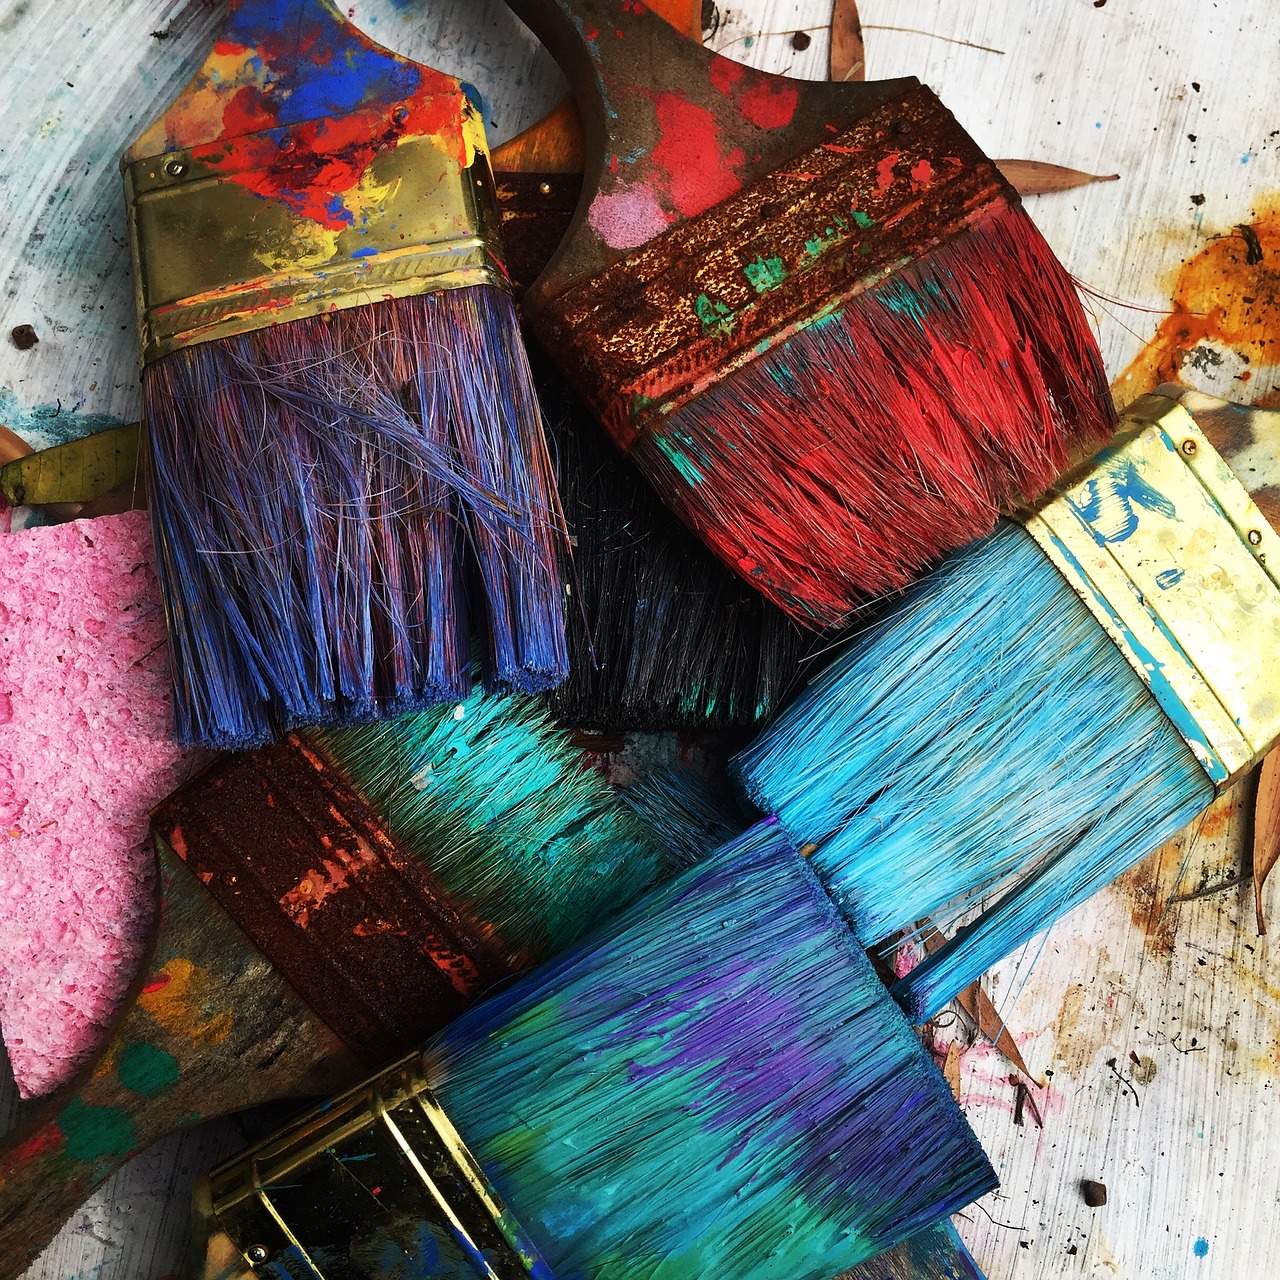 Pittura X Muri Interni.Pittura Per Pareti Quale Vernice Scegliere Per Imbiancare